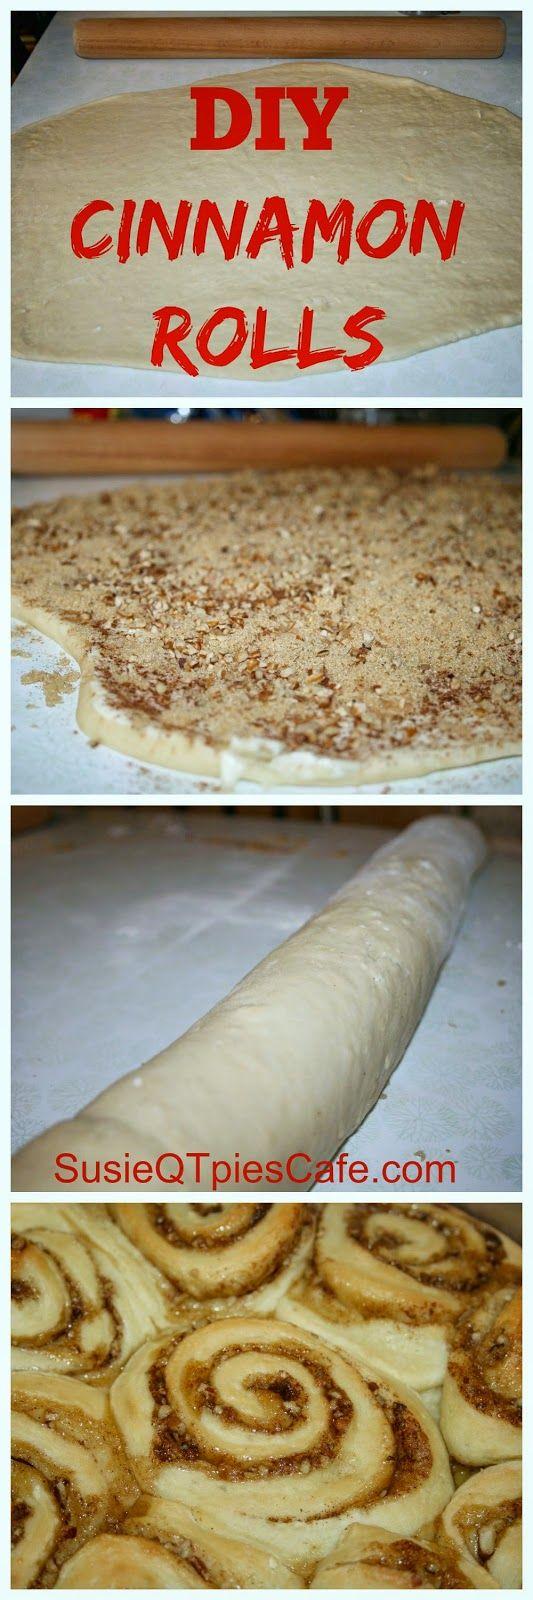 DIY Cinnamon Rolls - perfect for Easter Breakfast or Brunch